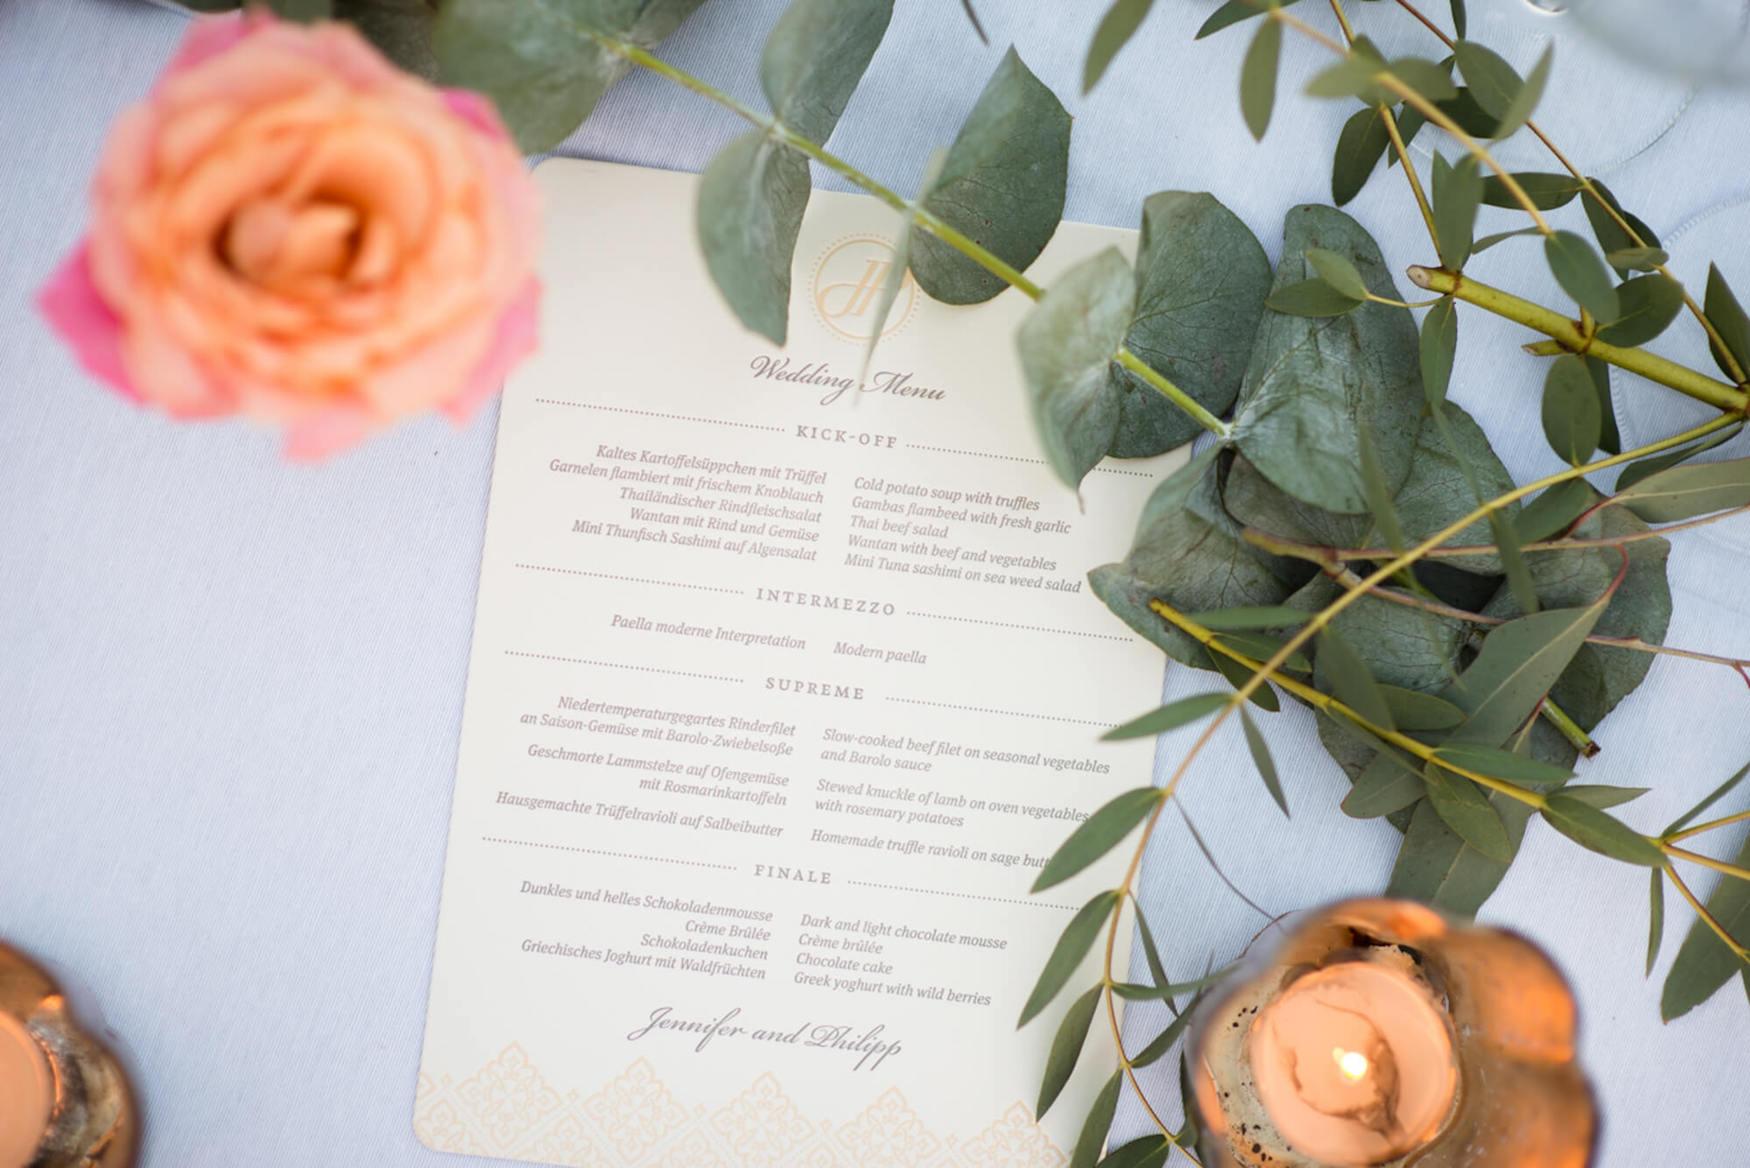 wedding dinner menu embossed tea lights flower table centers